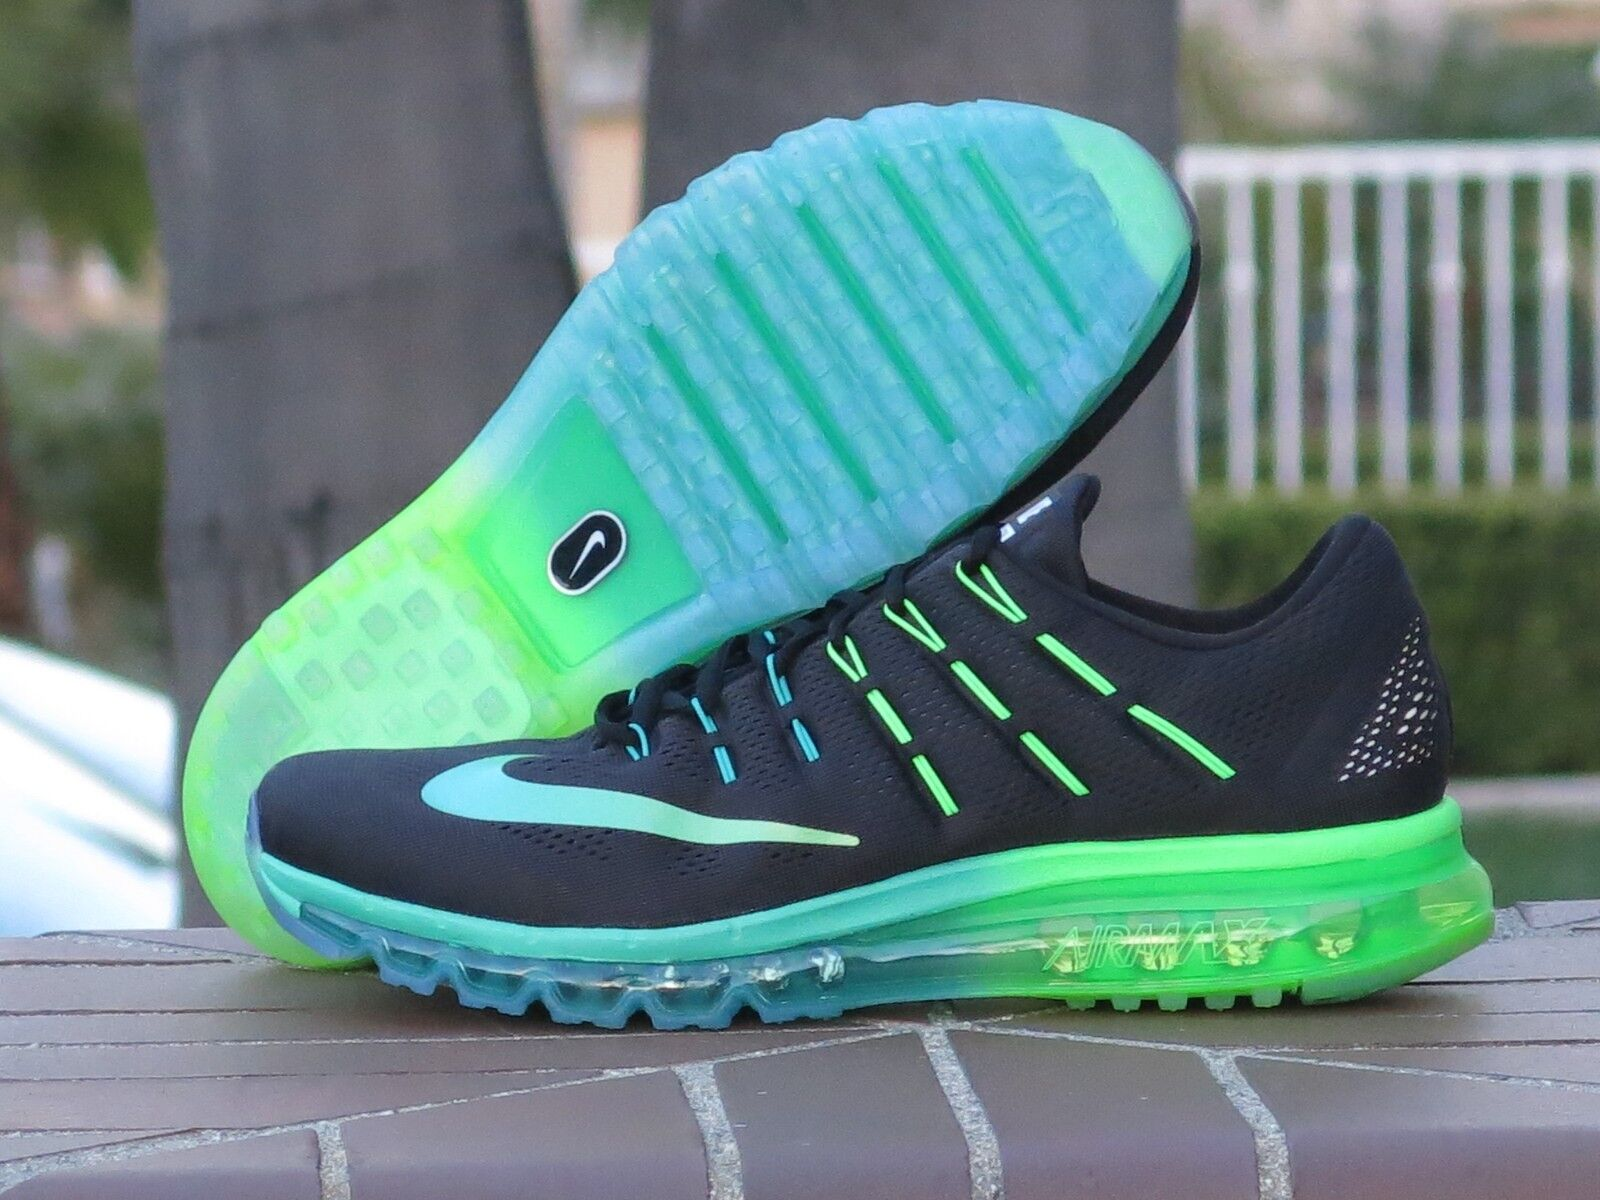 Men's Nike Air Max 2016 Running, Cross Training Sneakers 806771-003 SZ 13